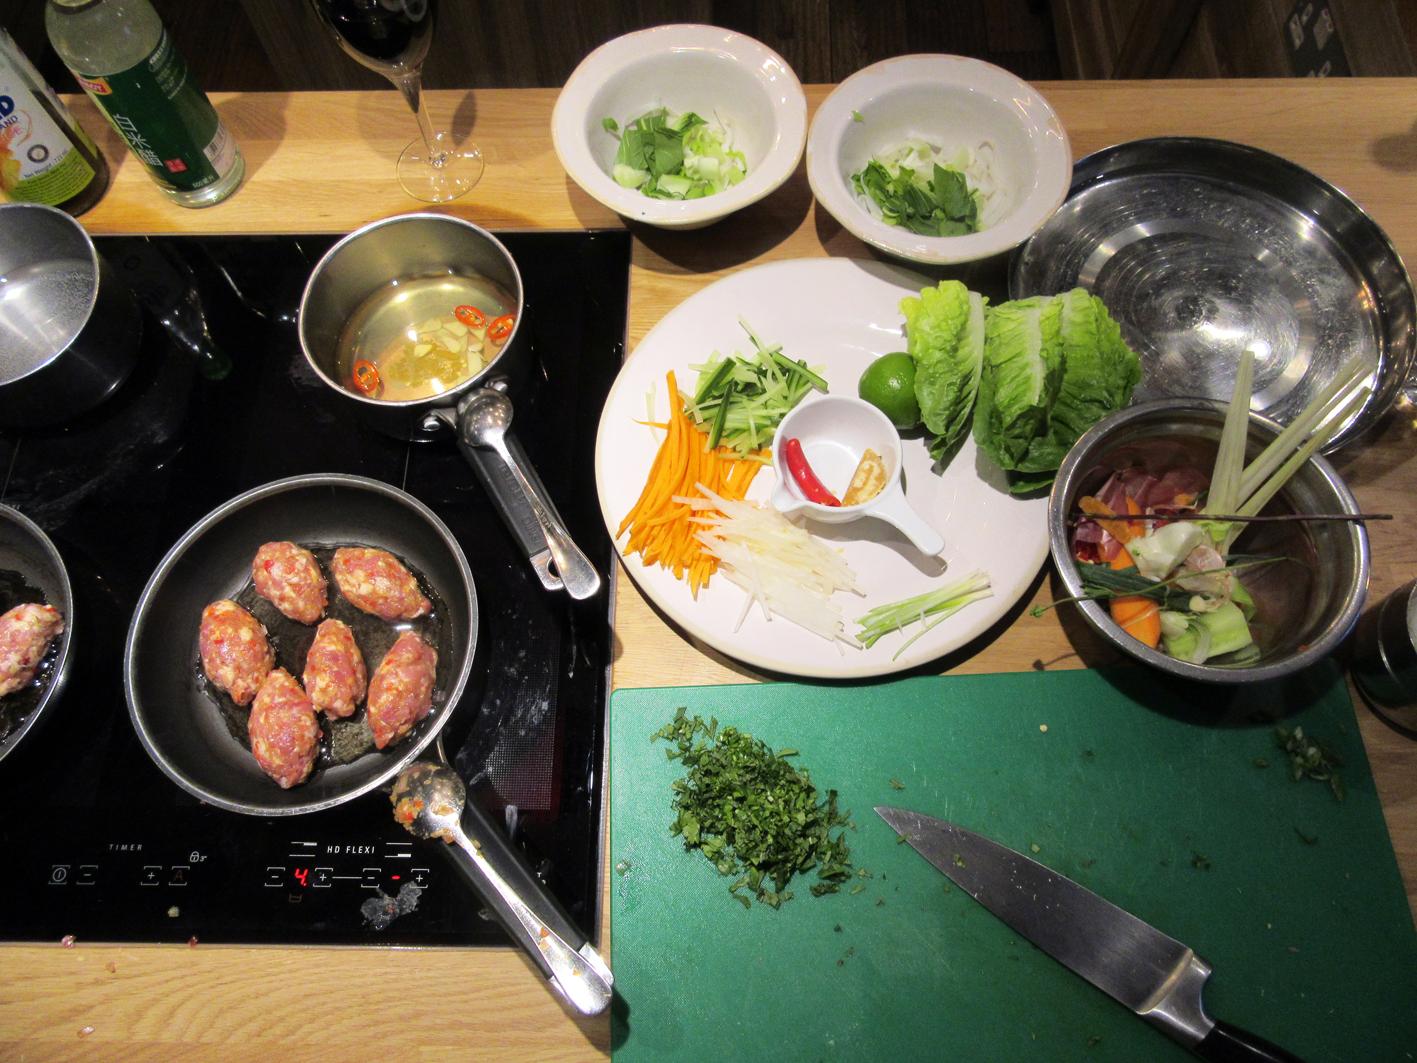 jamie-oliver-cookery-school_table